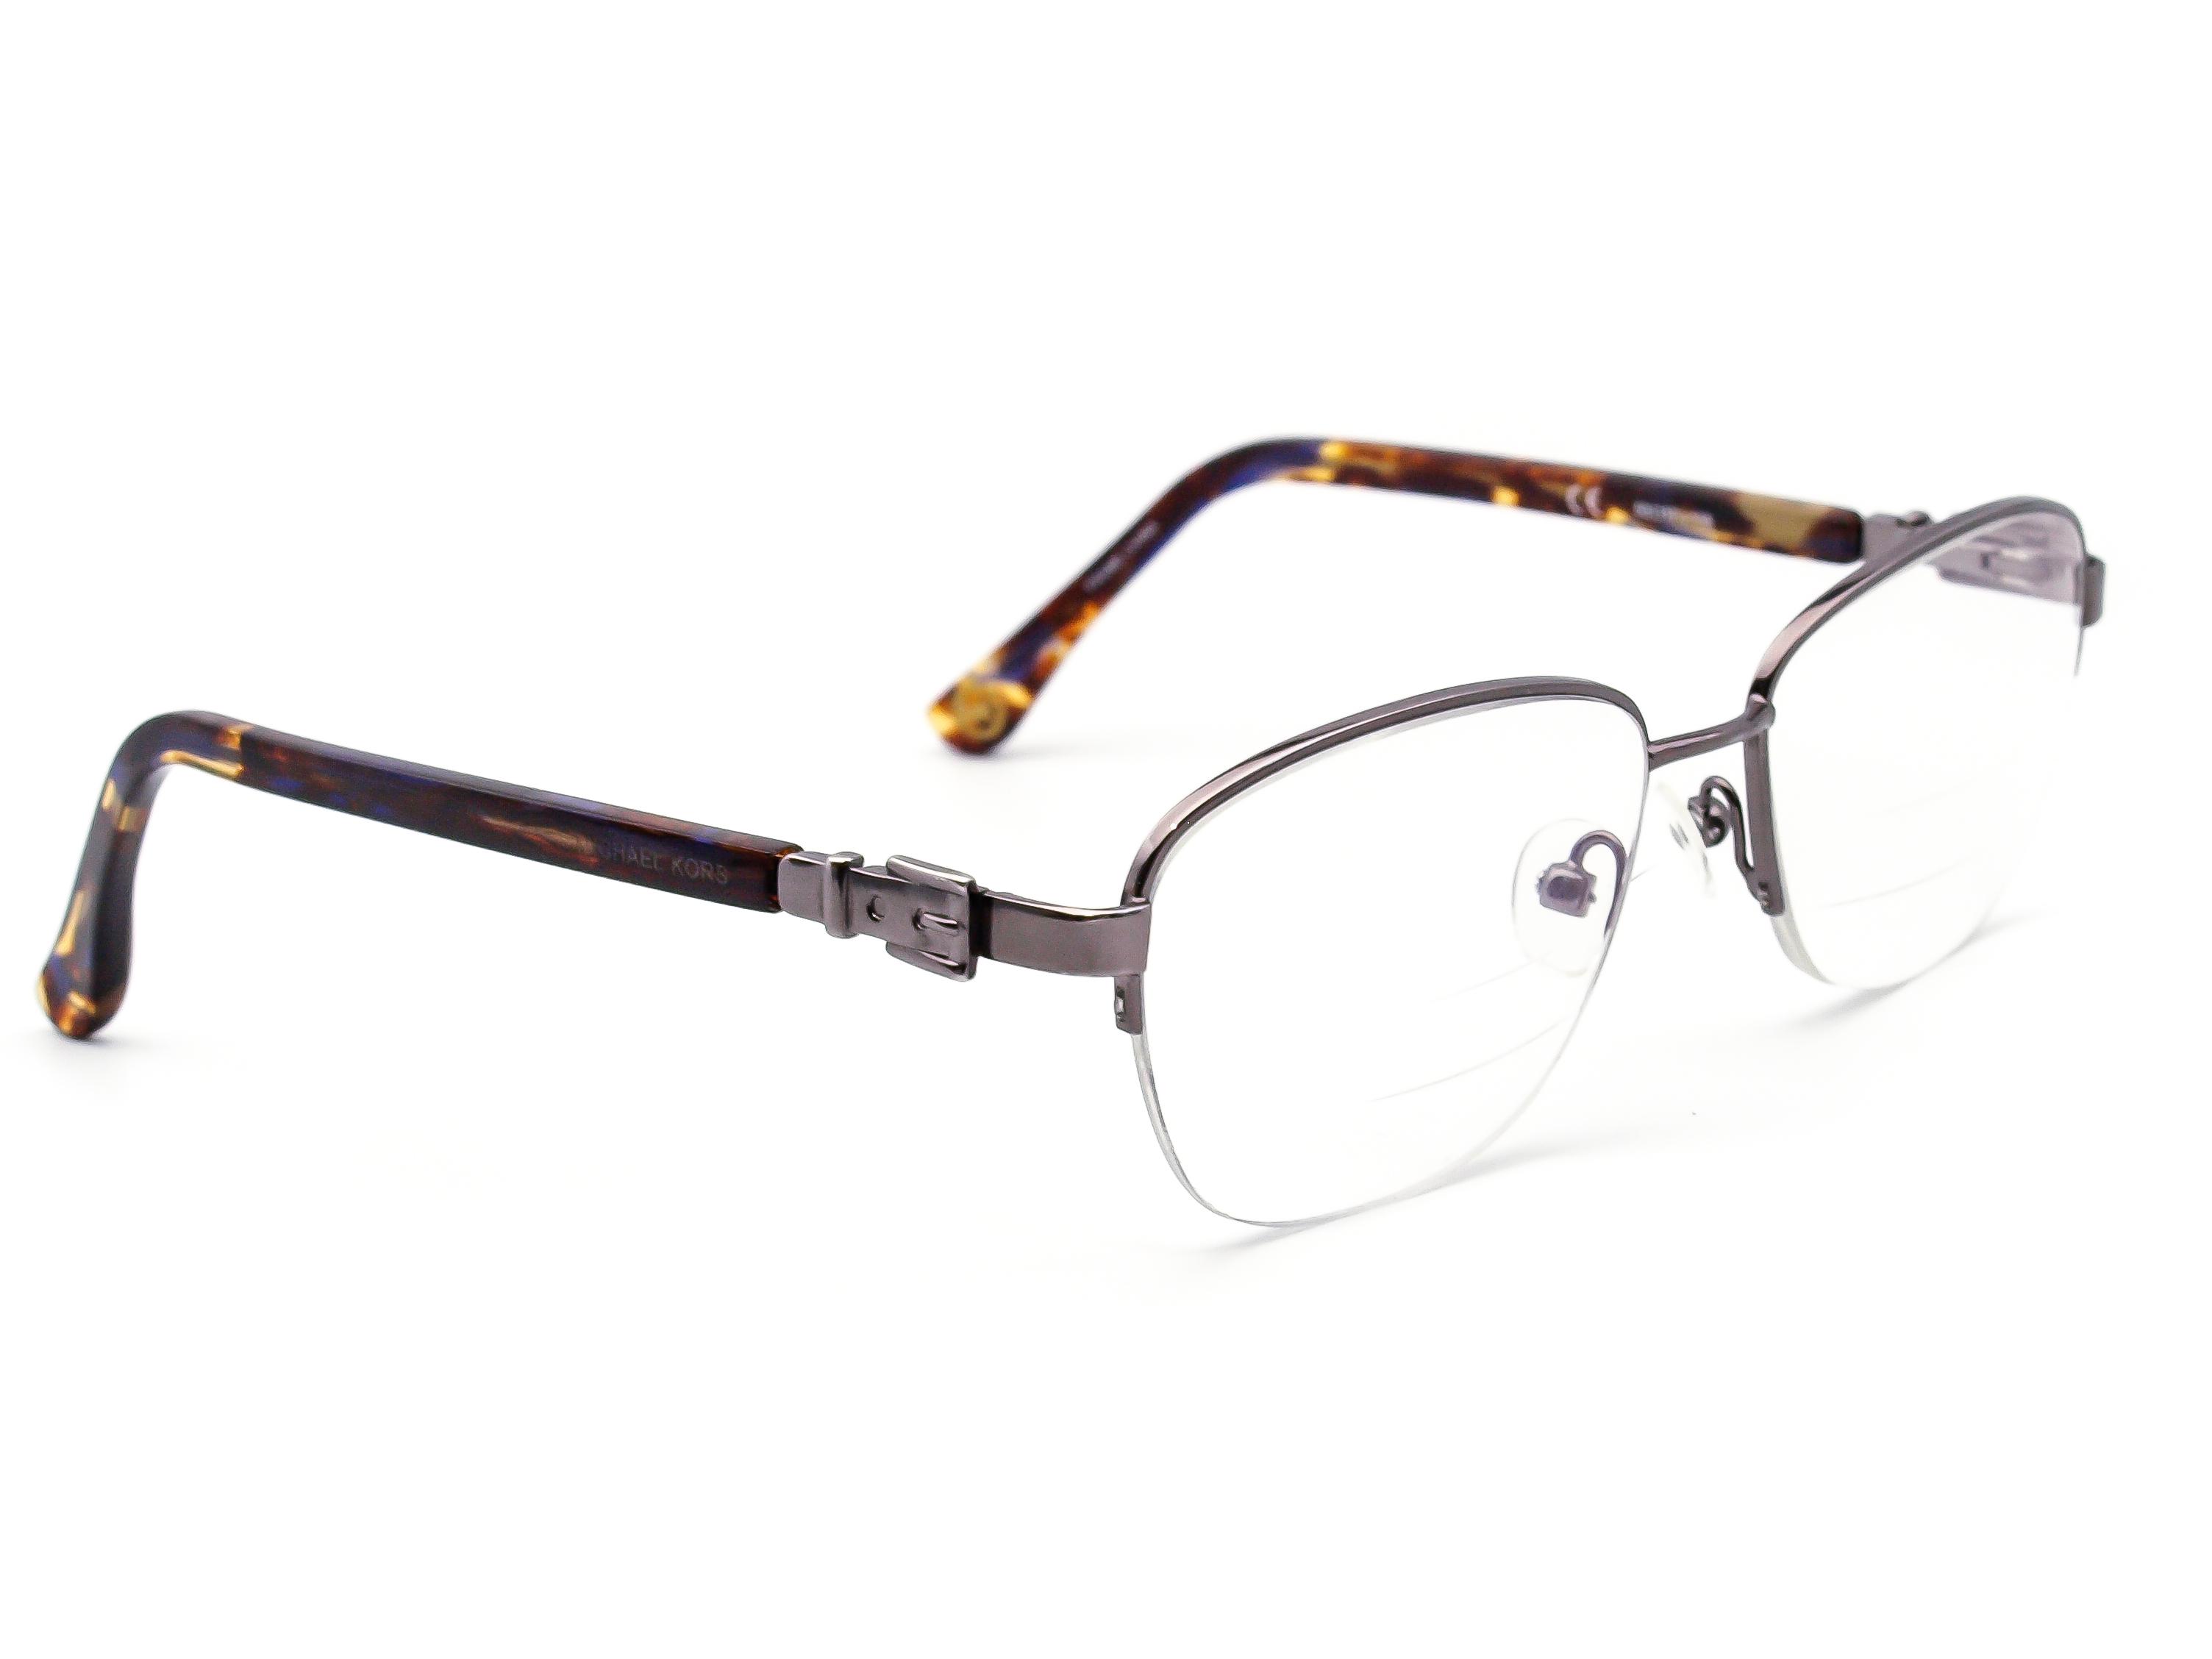 Pre Owned Michael Kors Eyeglasses And Sunglasses